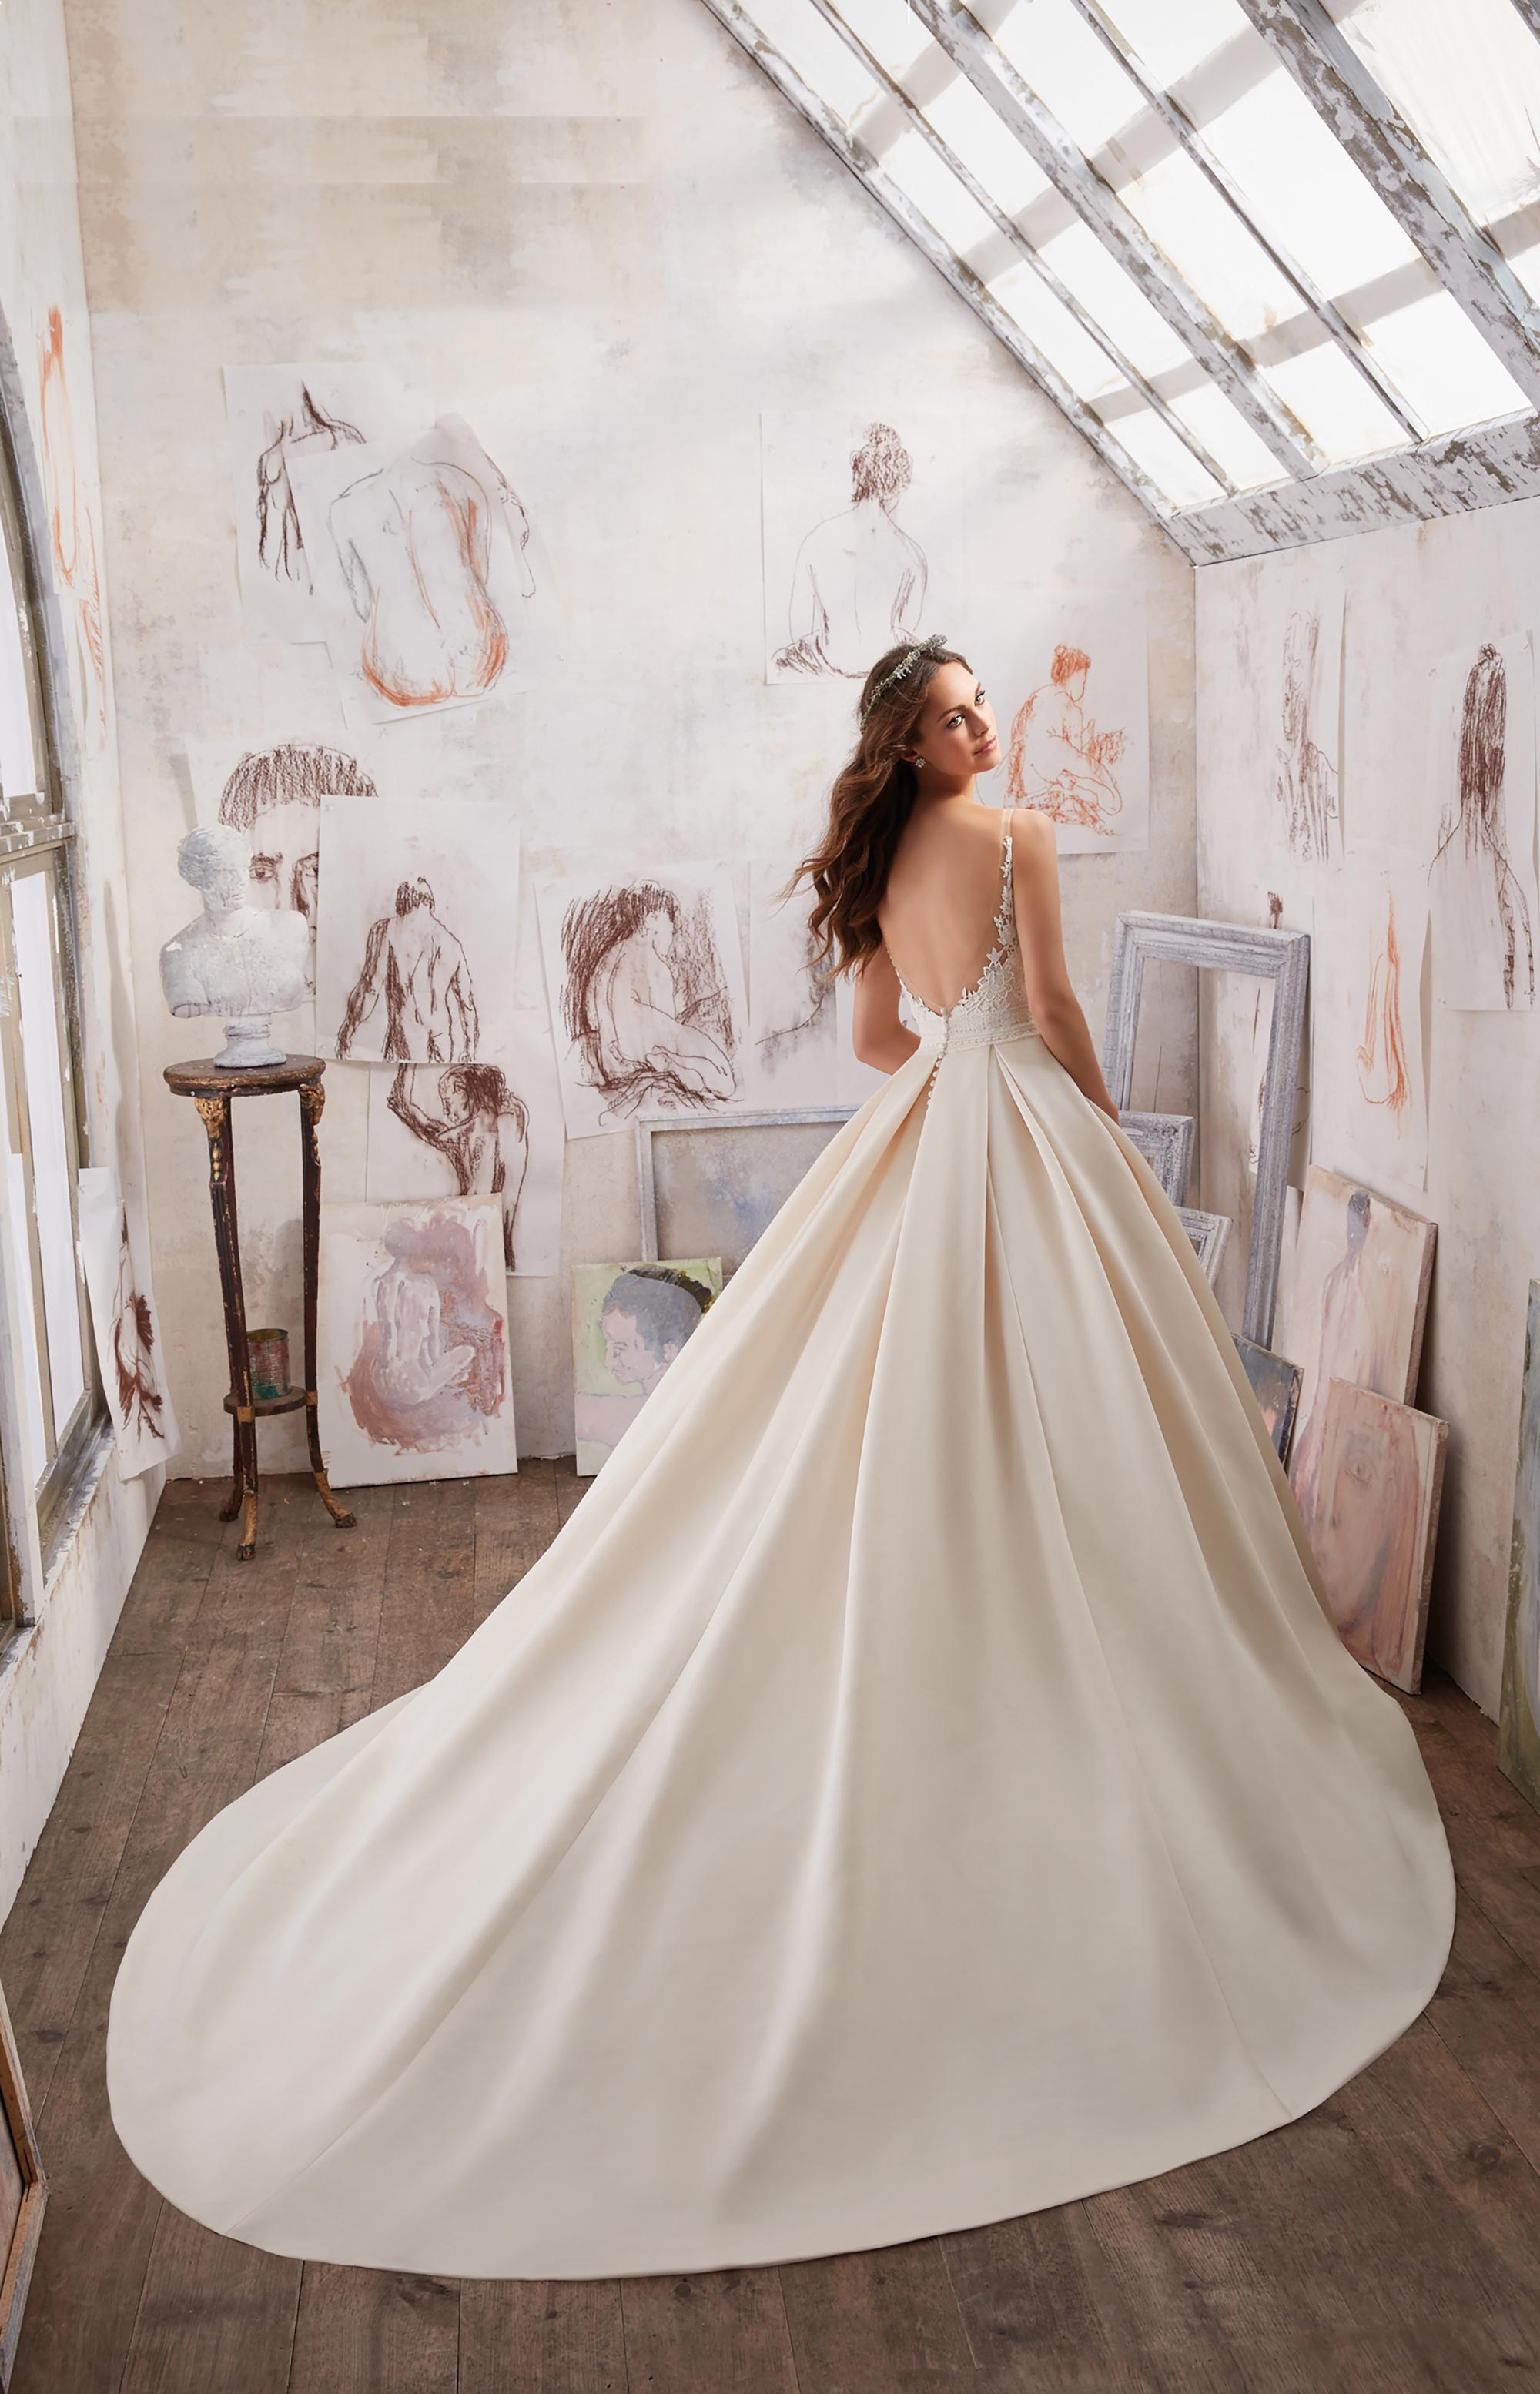 Vestido Lucía Fiesta 2019 mod. 5501 - 3